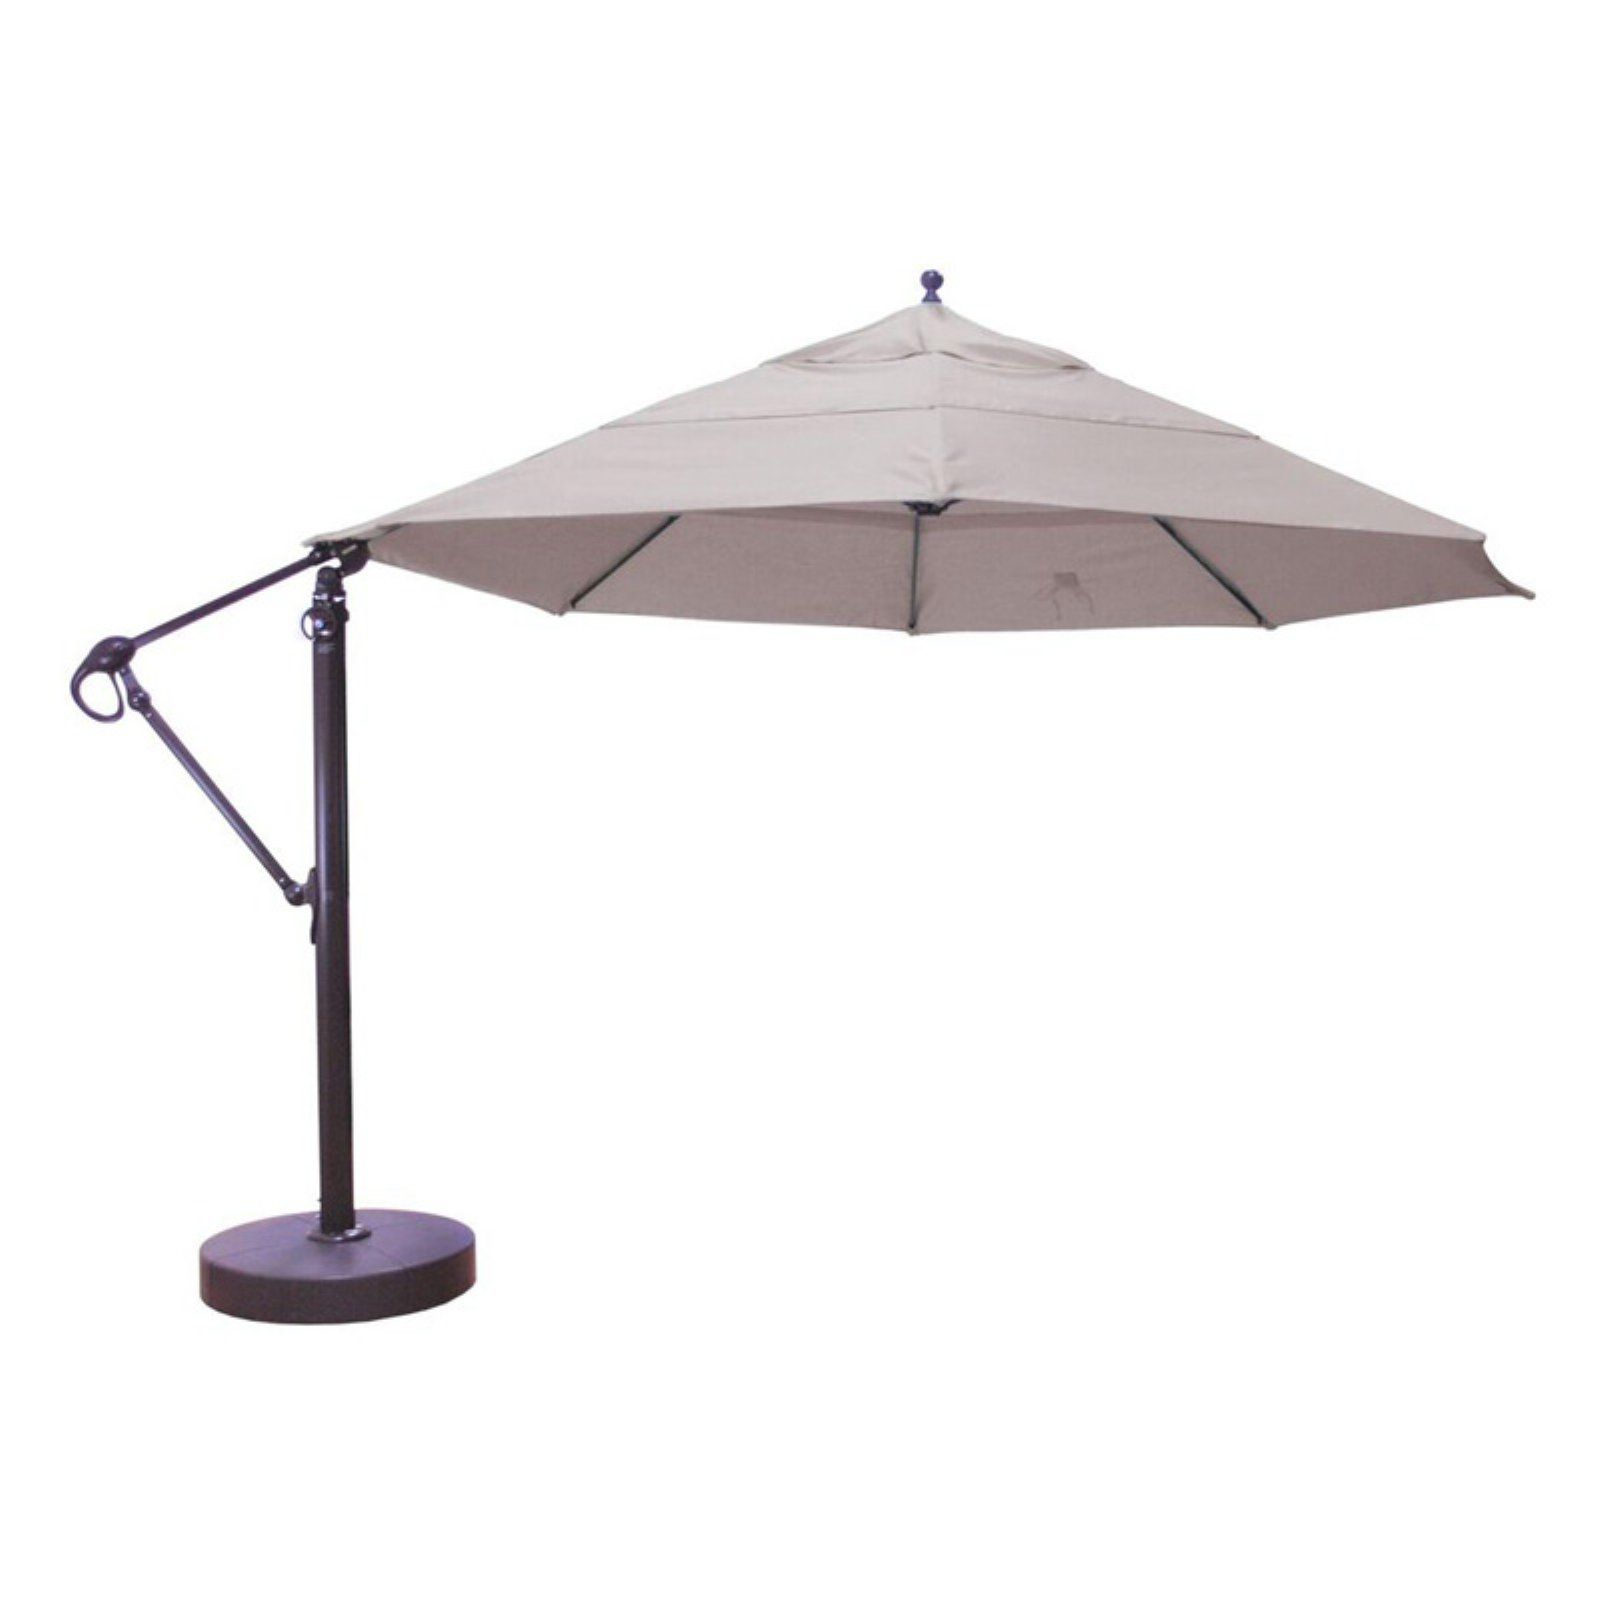 a6eed1727cef Galtech 13 ft. Aluminum Cantilever Patio Umbrella with Easy Lift and Tilt  Sunbrella Stone Linen